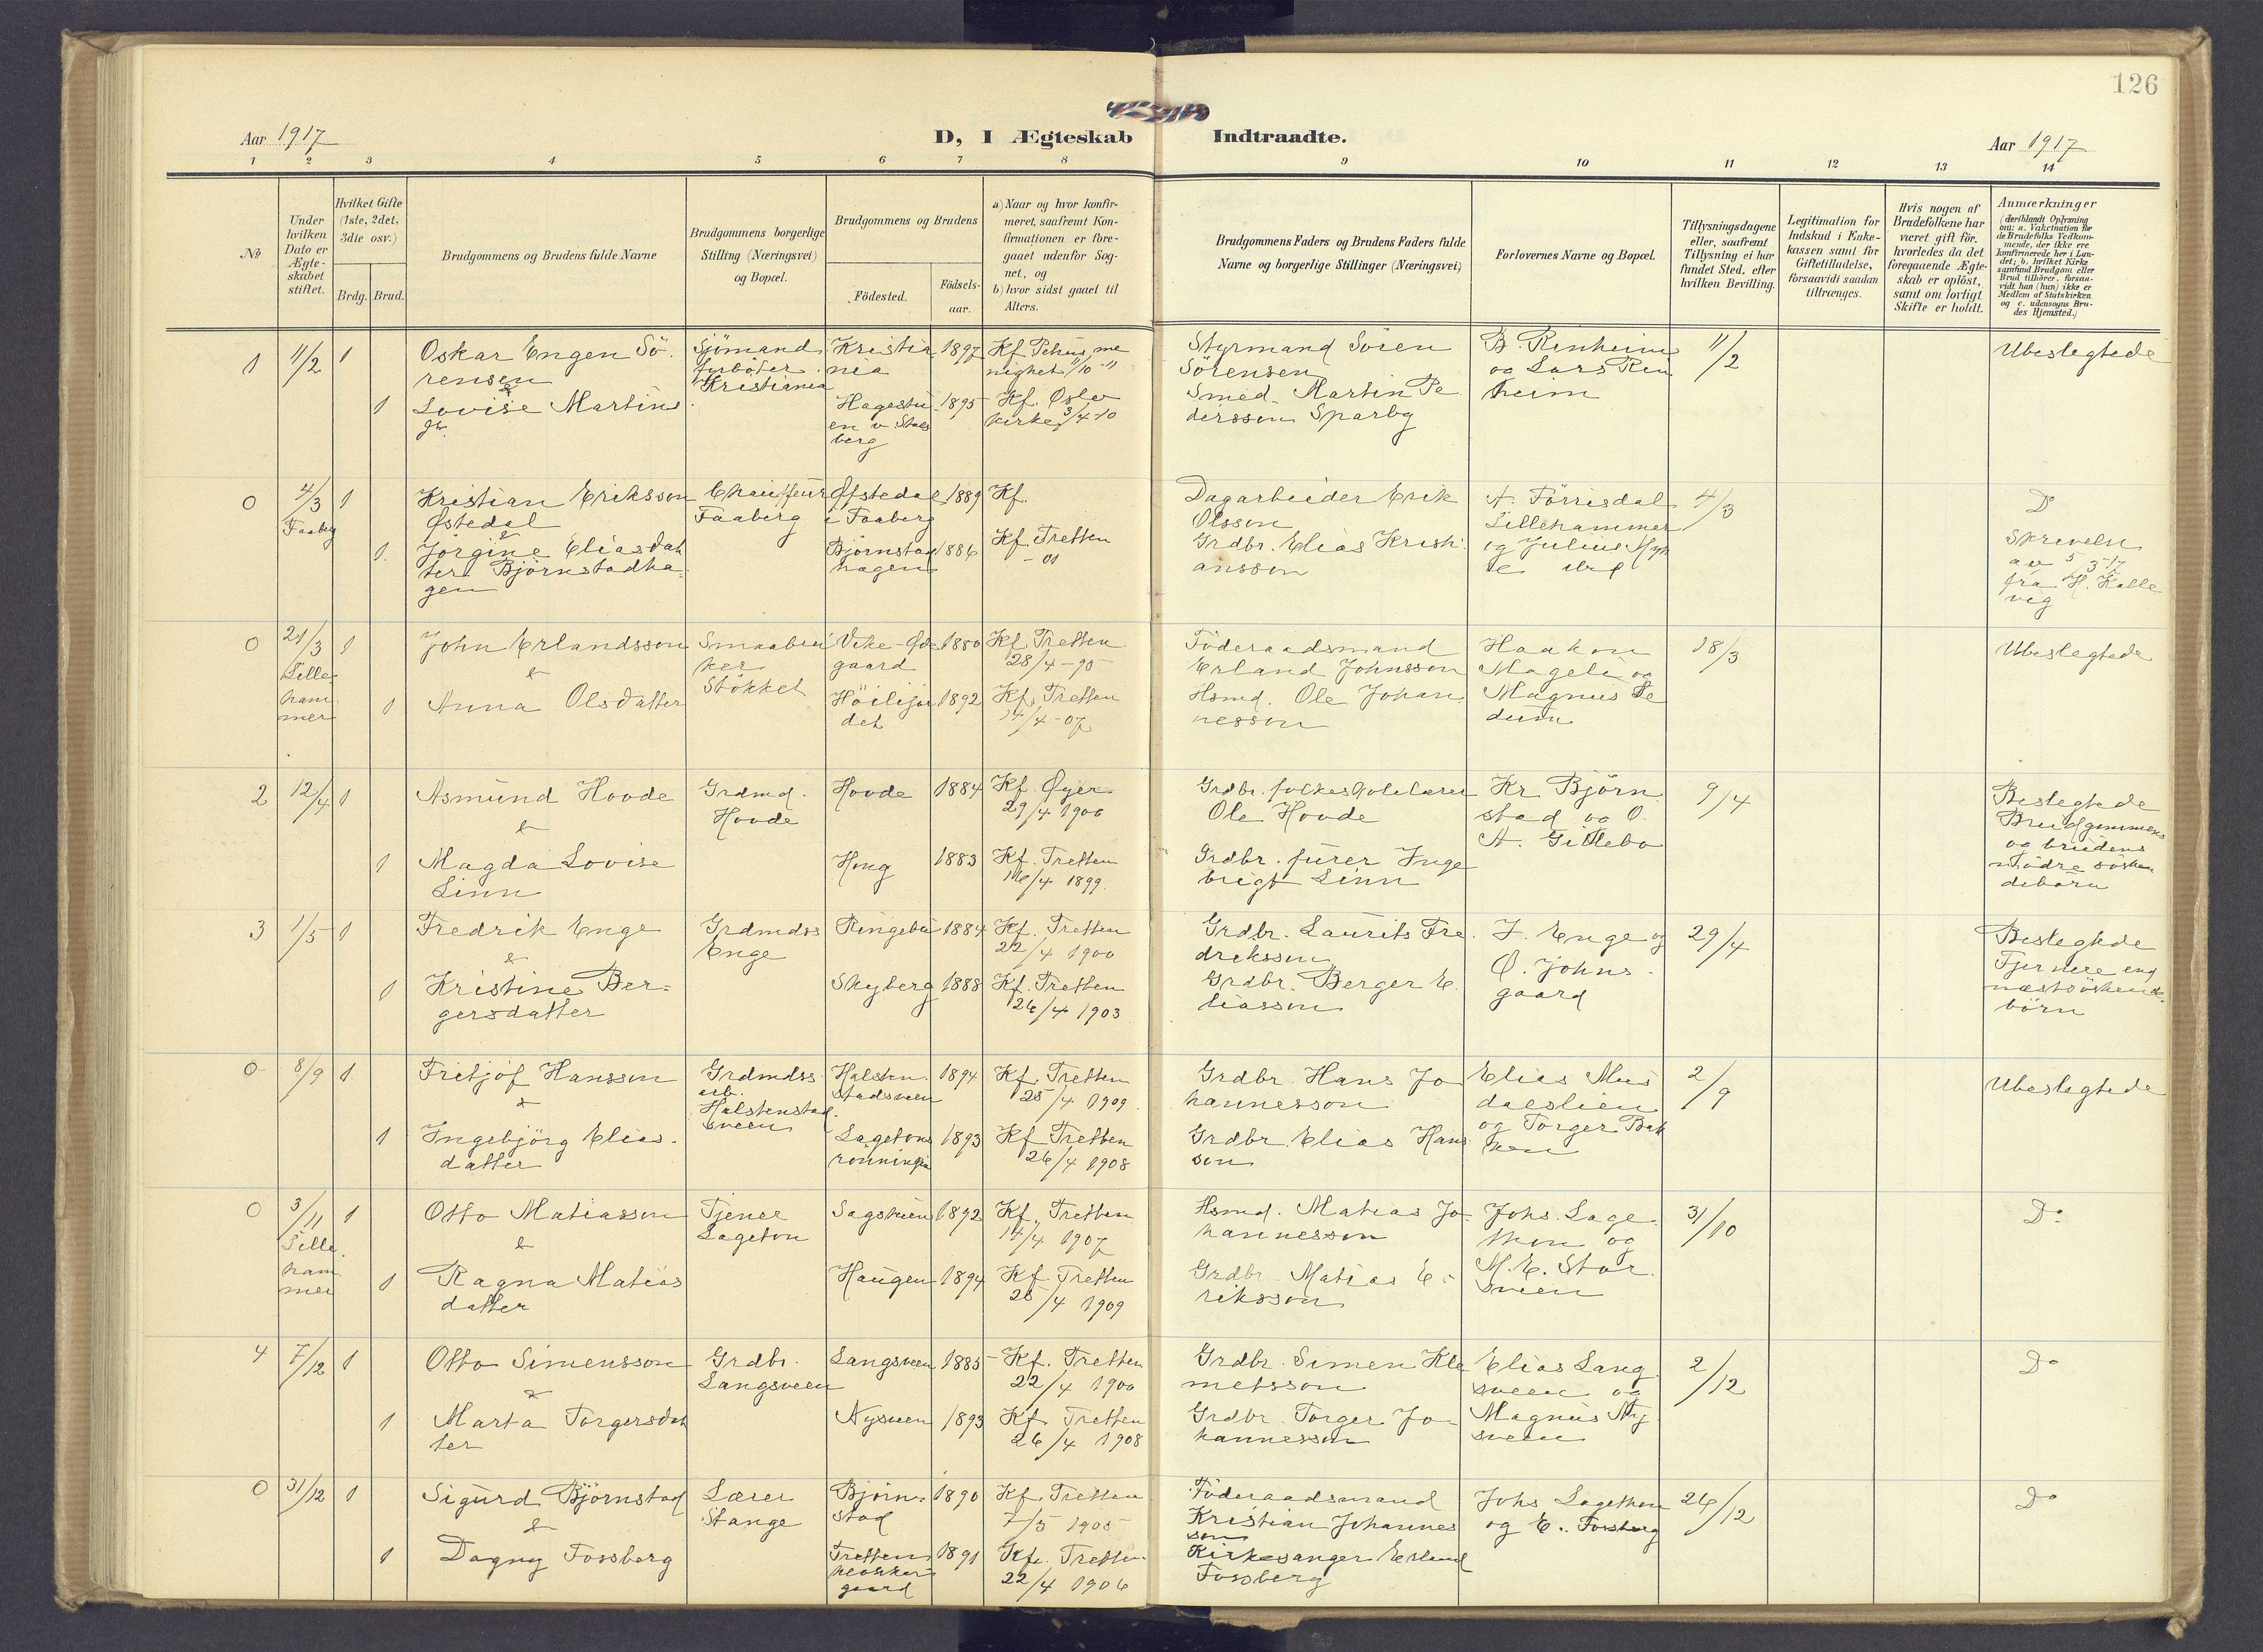 SAH, Øyer prestekontor, Ministerialbok nr. 13, 1905-1920, s. 126